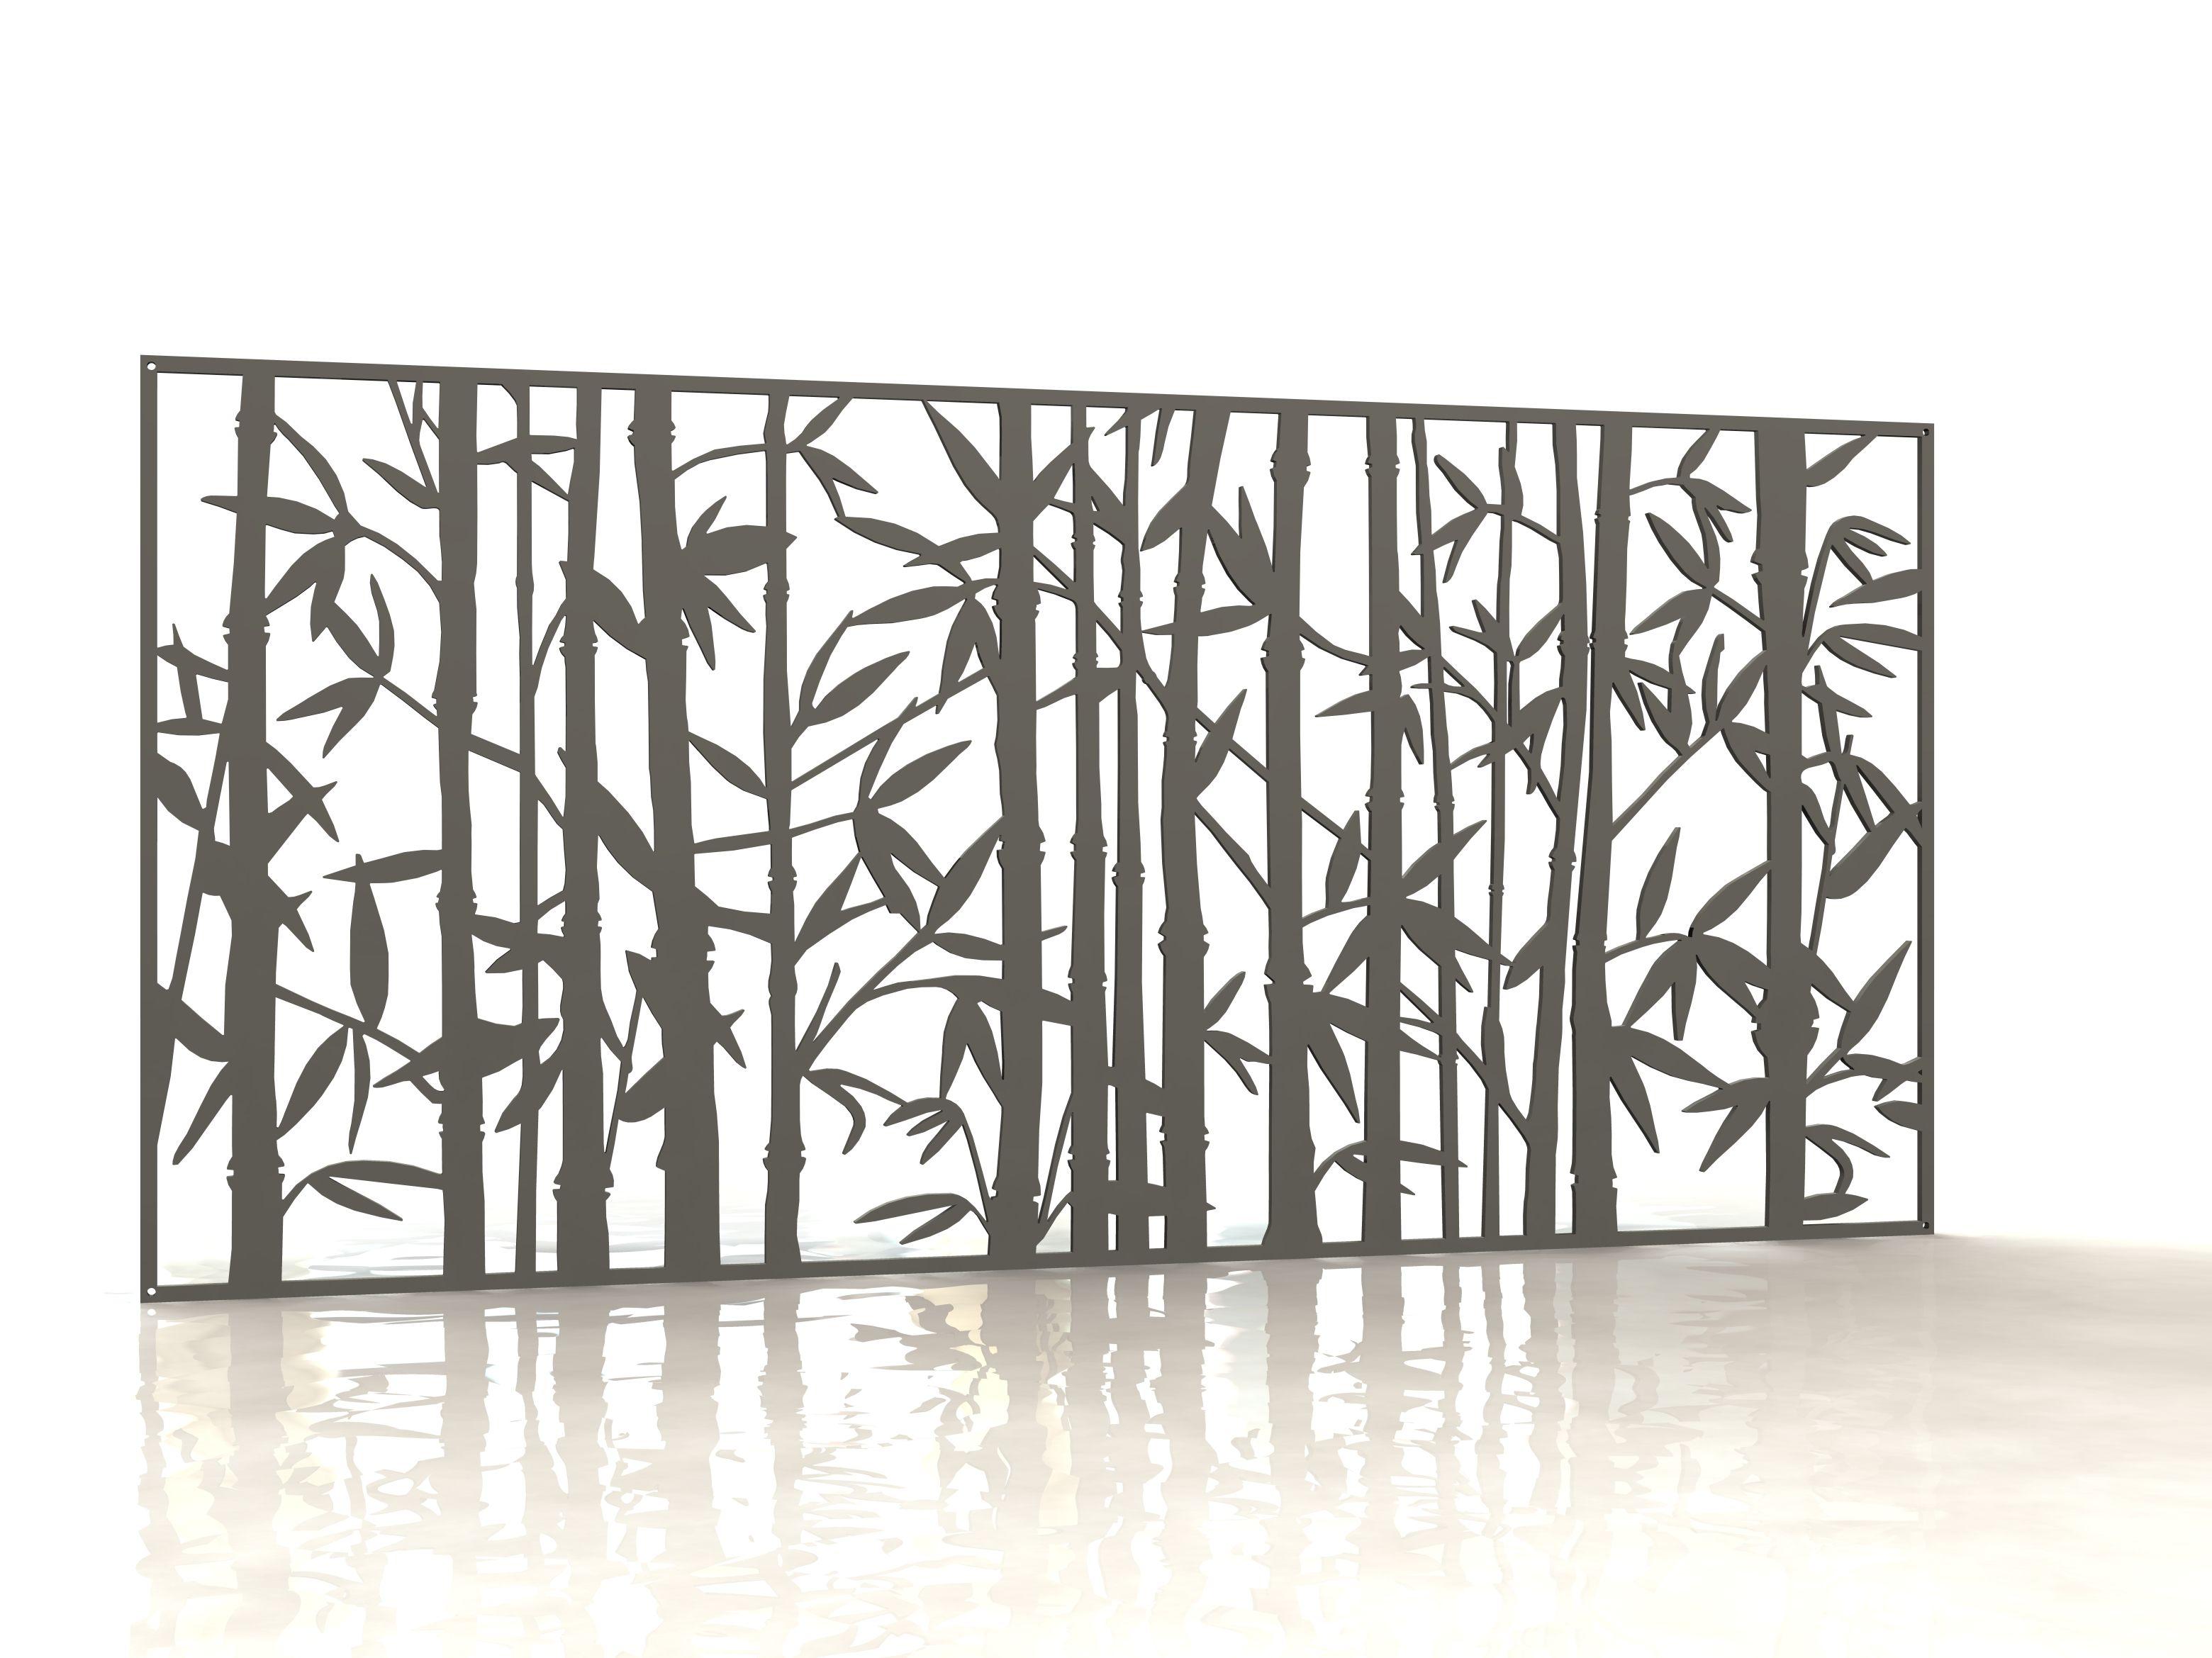 bamboo panneau design d coupe laser laser cut panels racken racken metal made in. Black Bedroom Furniture Sets. Home Design Ideas